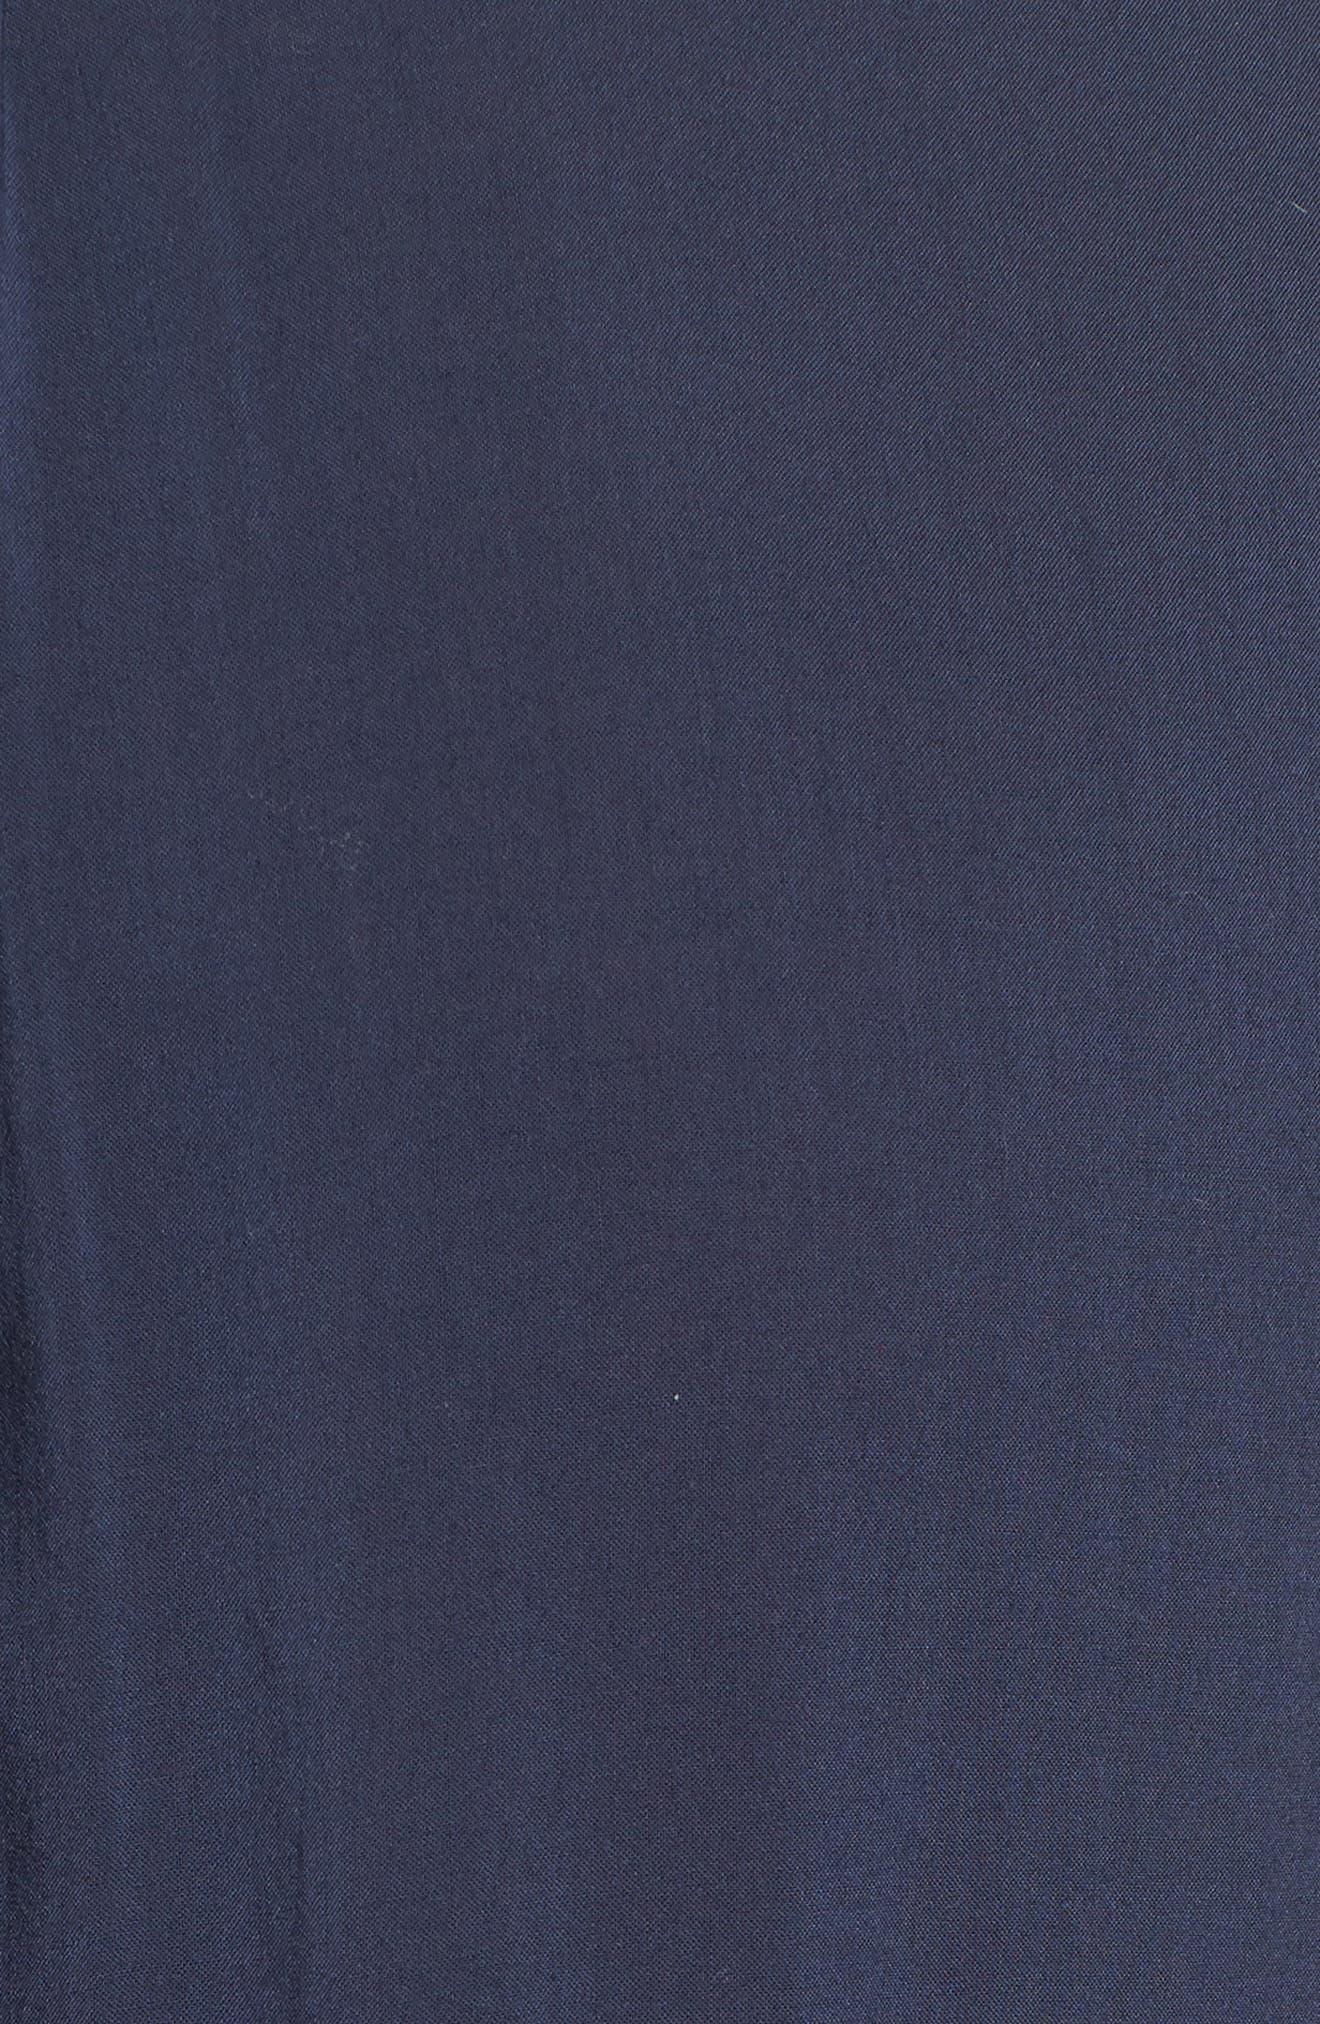 Lace Trim Sleeveless Blouse,                             Alternate thumbnail 5, color,                             POSTMAN